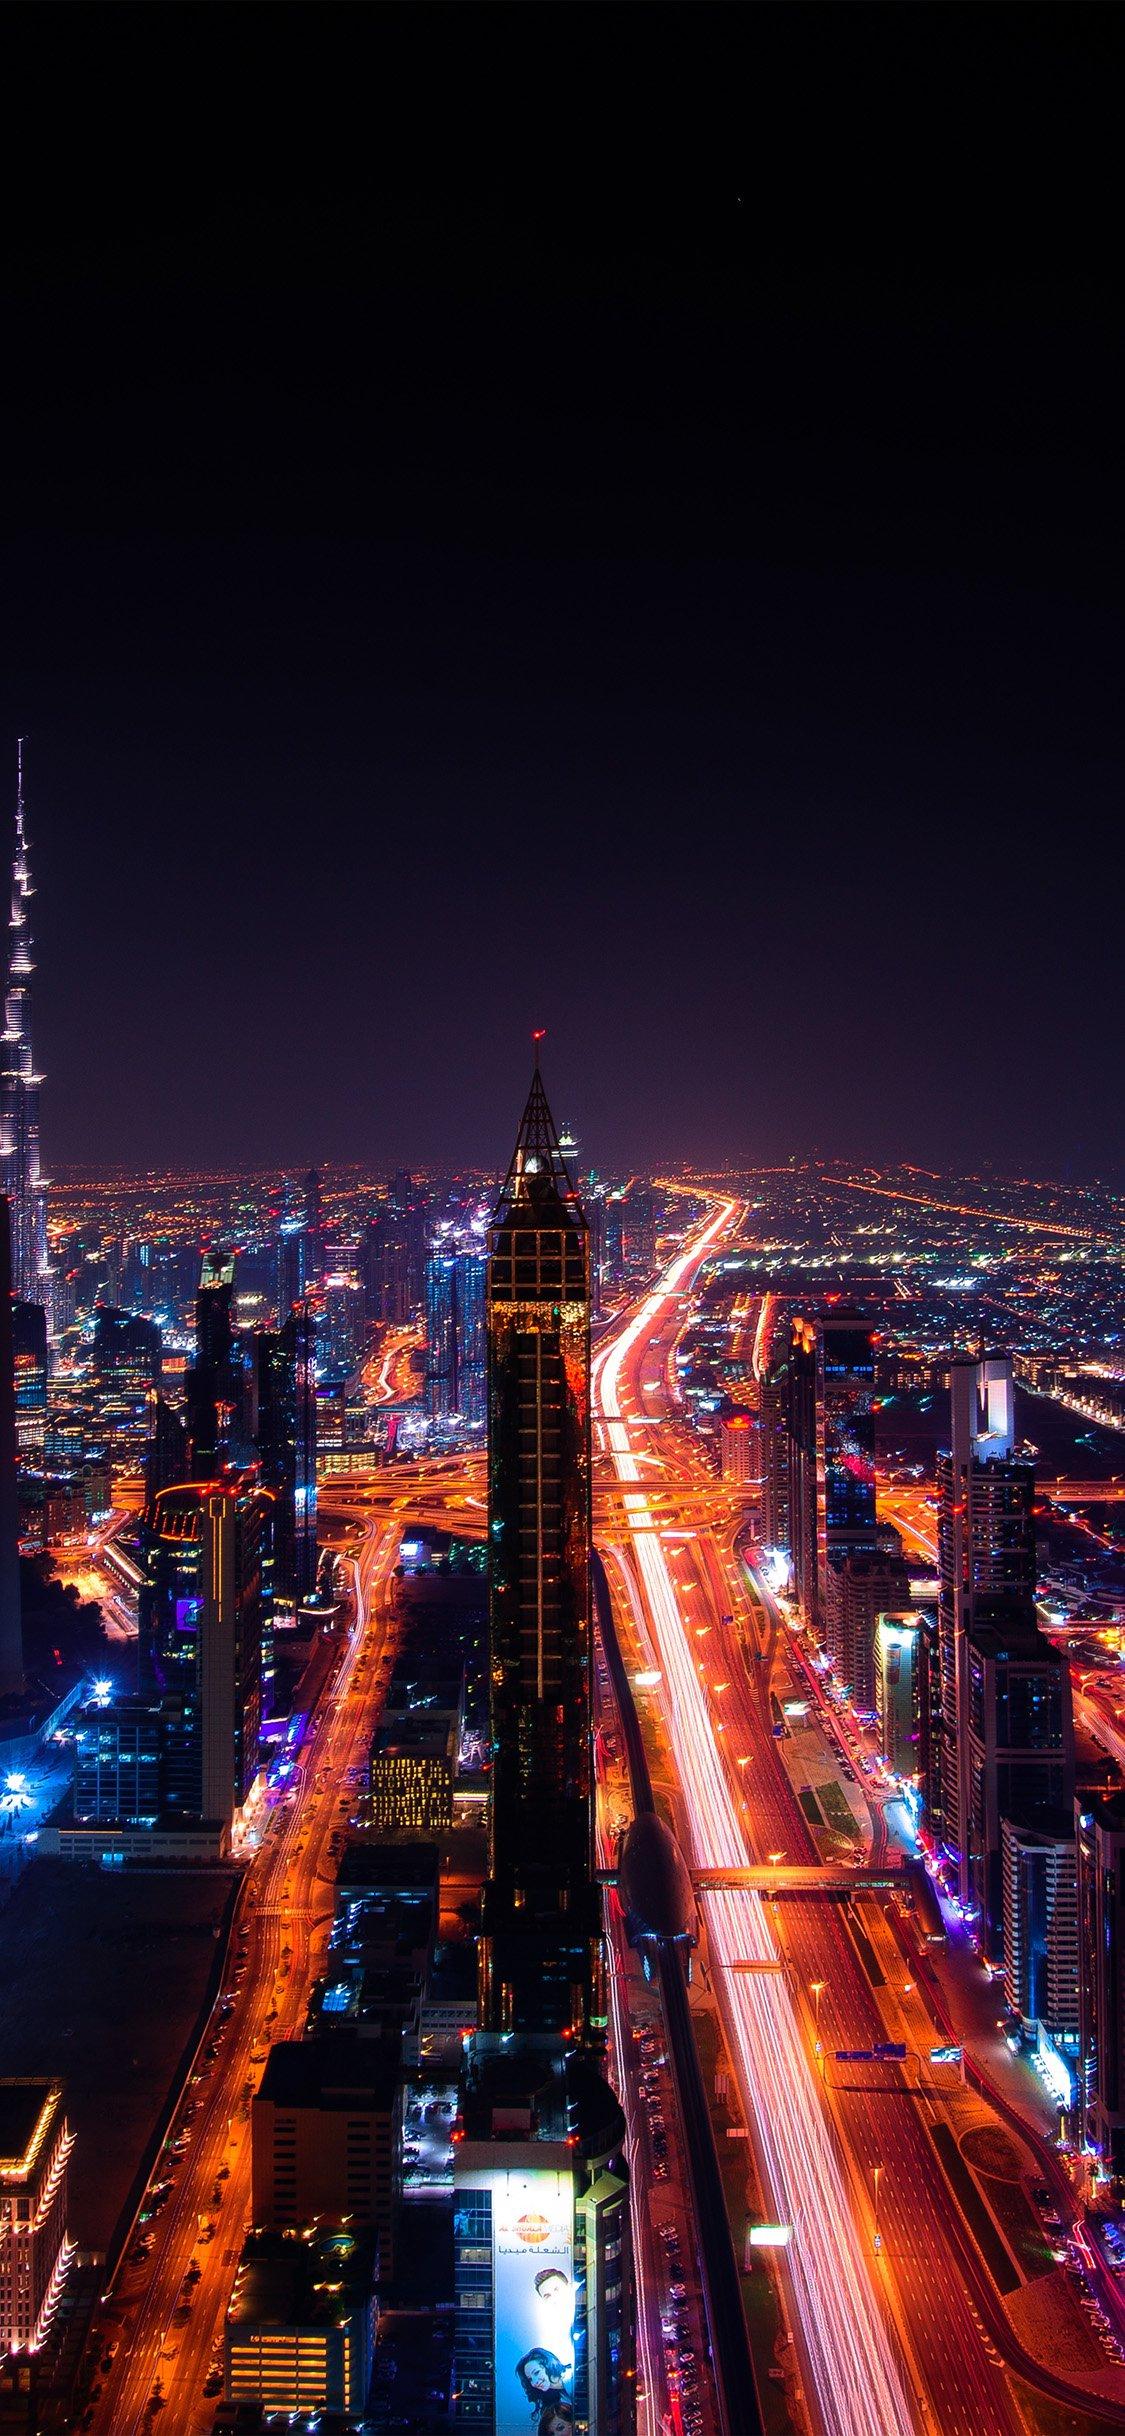 City Night Light Car Dark Iphone X Wallpapers Free Download